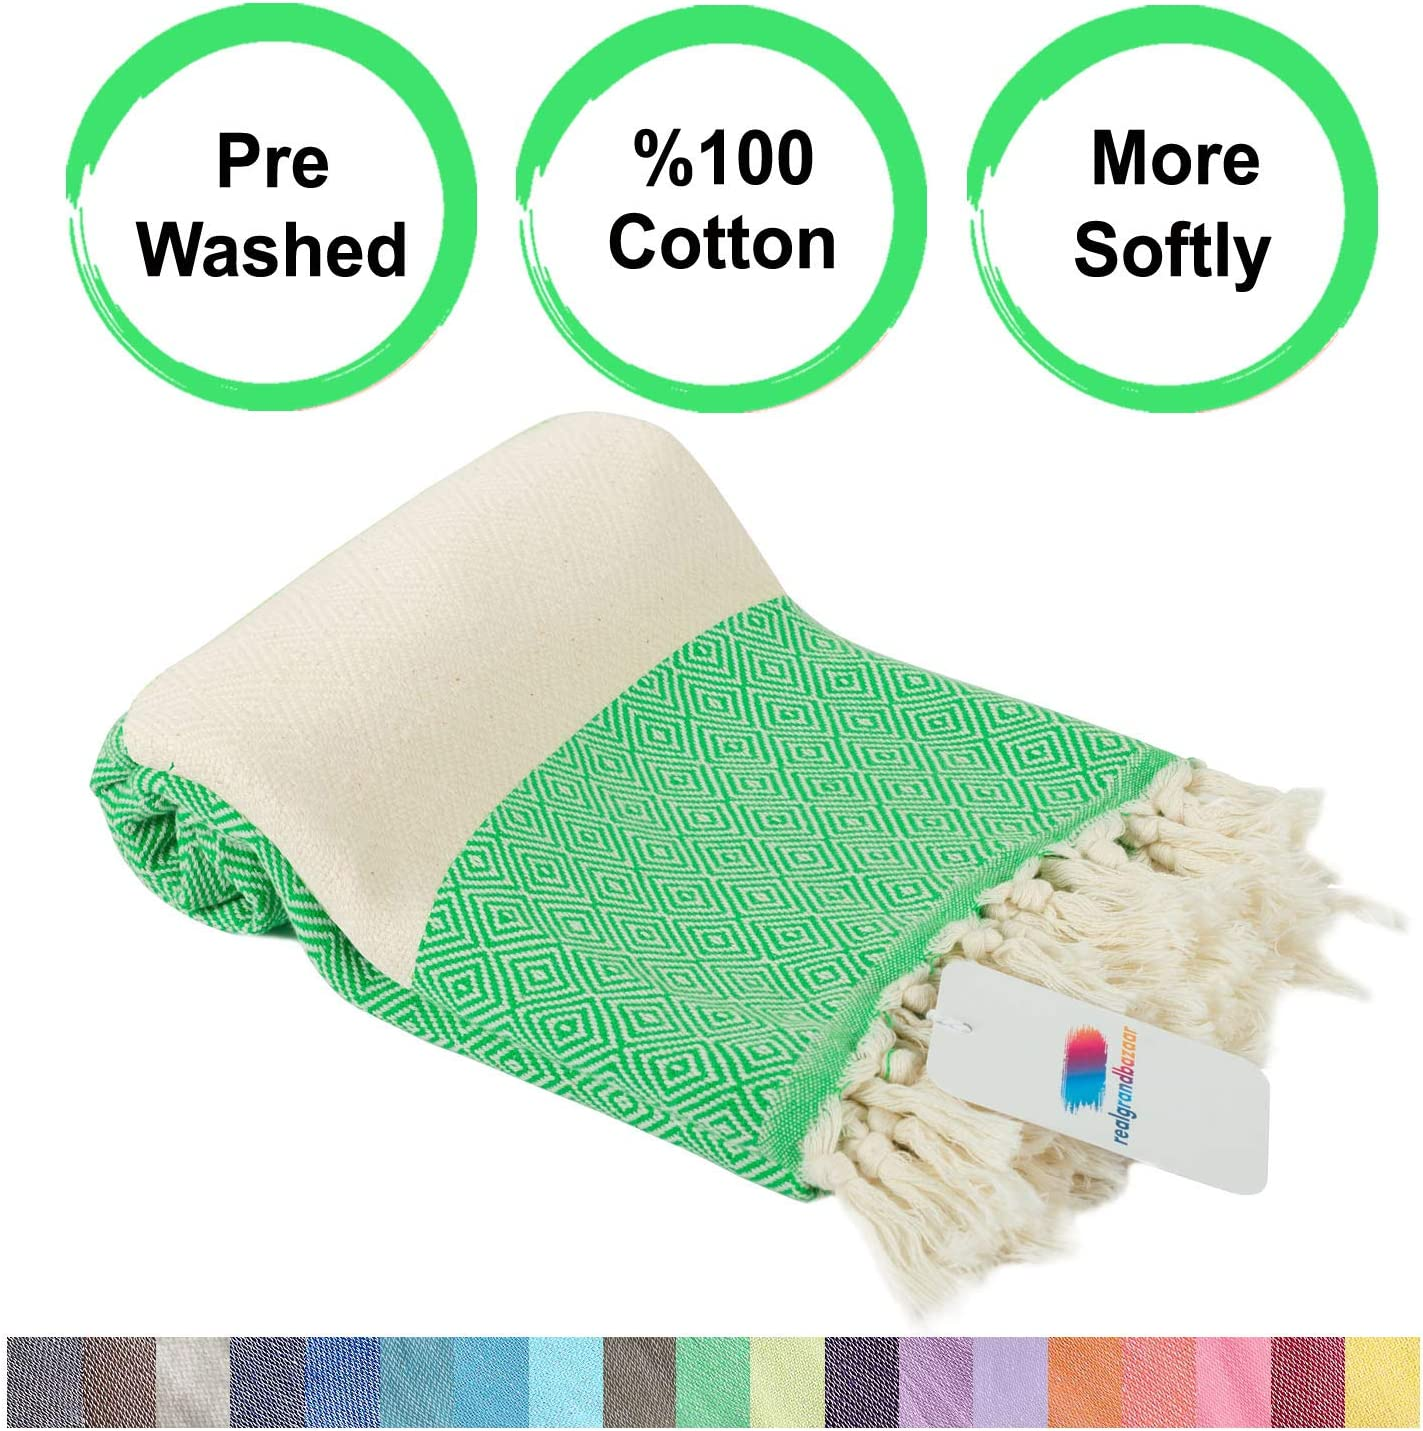 Brown Super Soft Towels Hammam realgrandbazaar Turkish Towels Beach Towel/%100 Cotton Peshtemal Pre Washed Softly 39 x 69 Beach Towels Oversized Large Bath Towels Pestemal